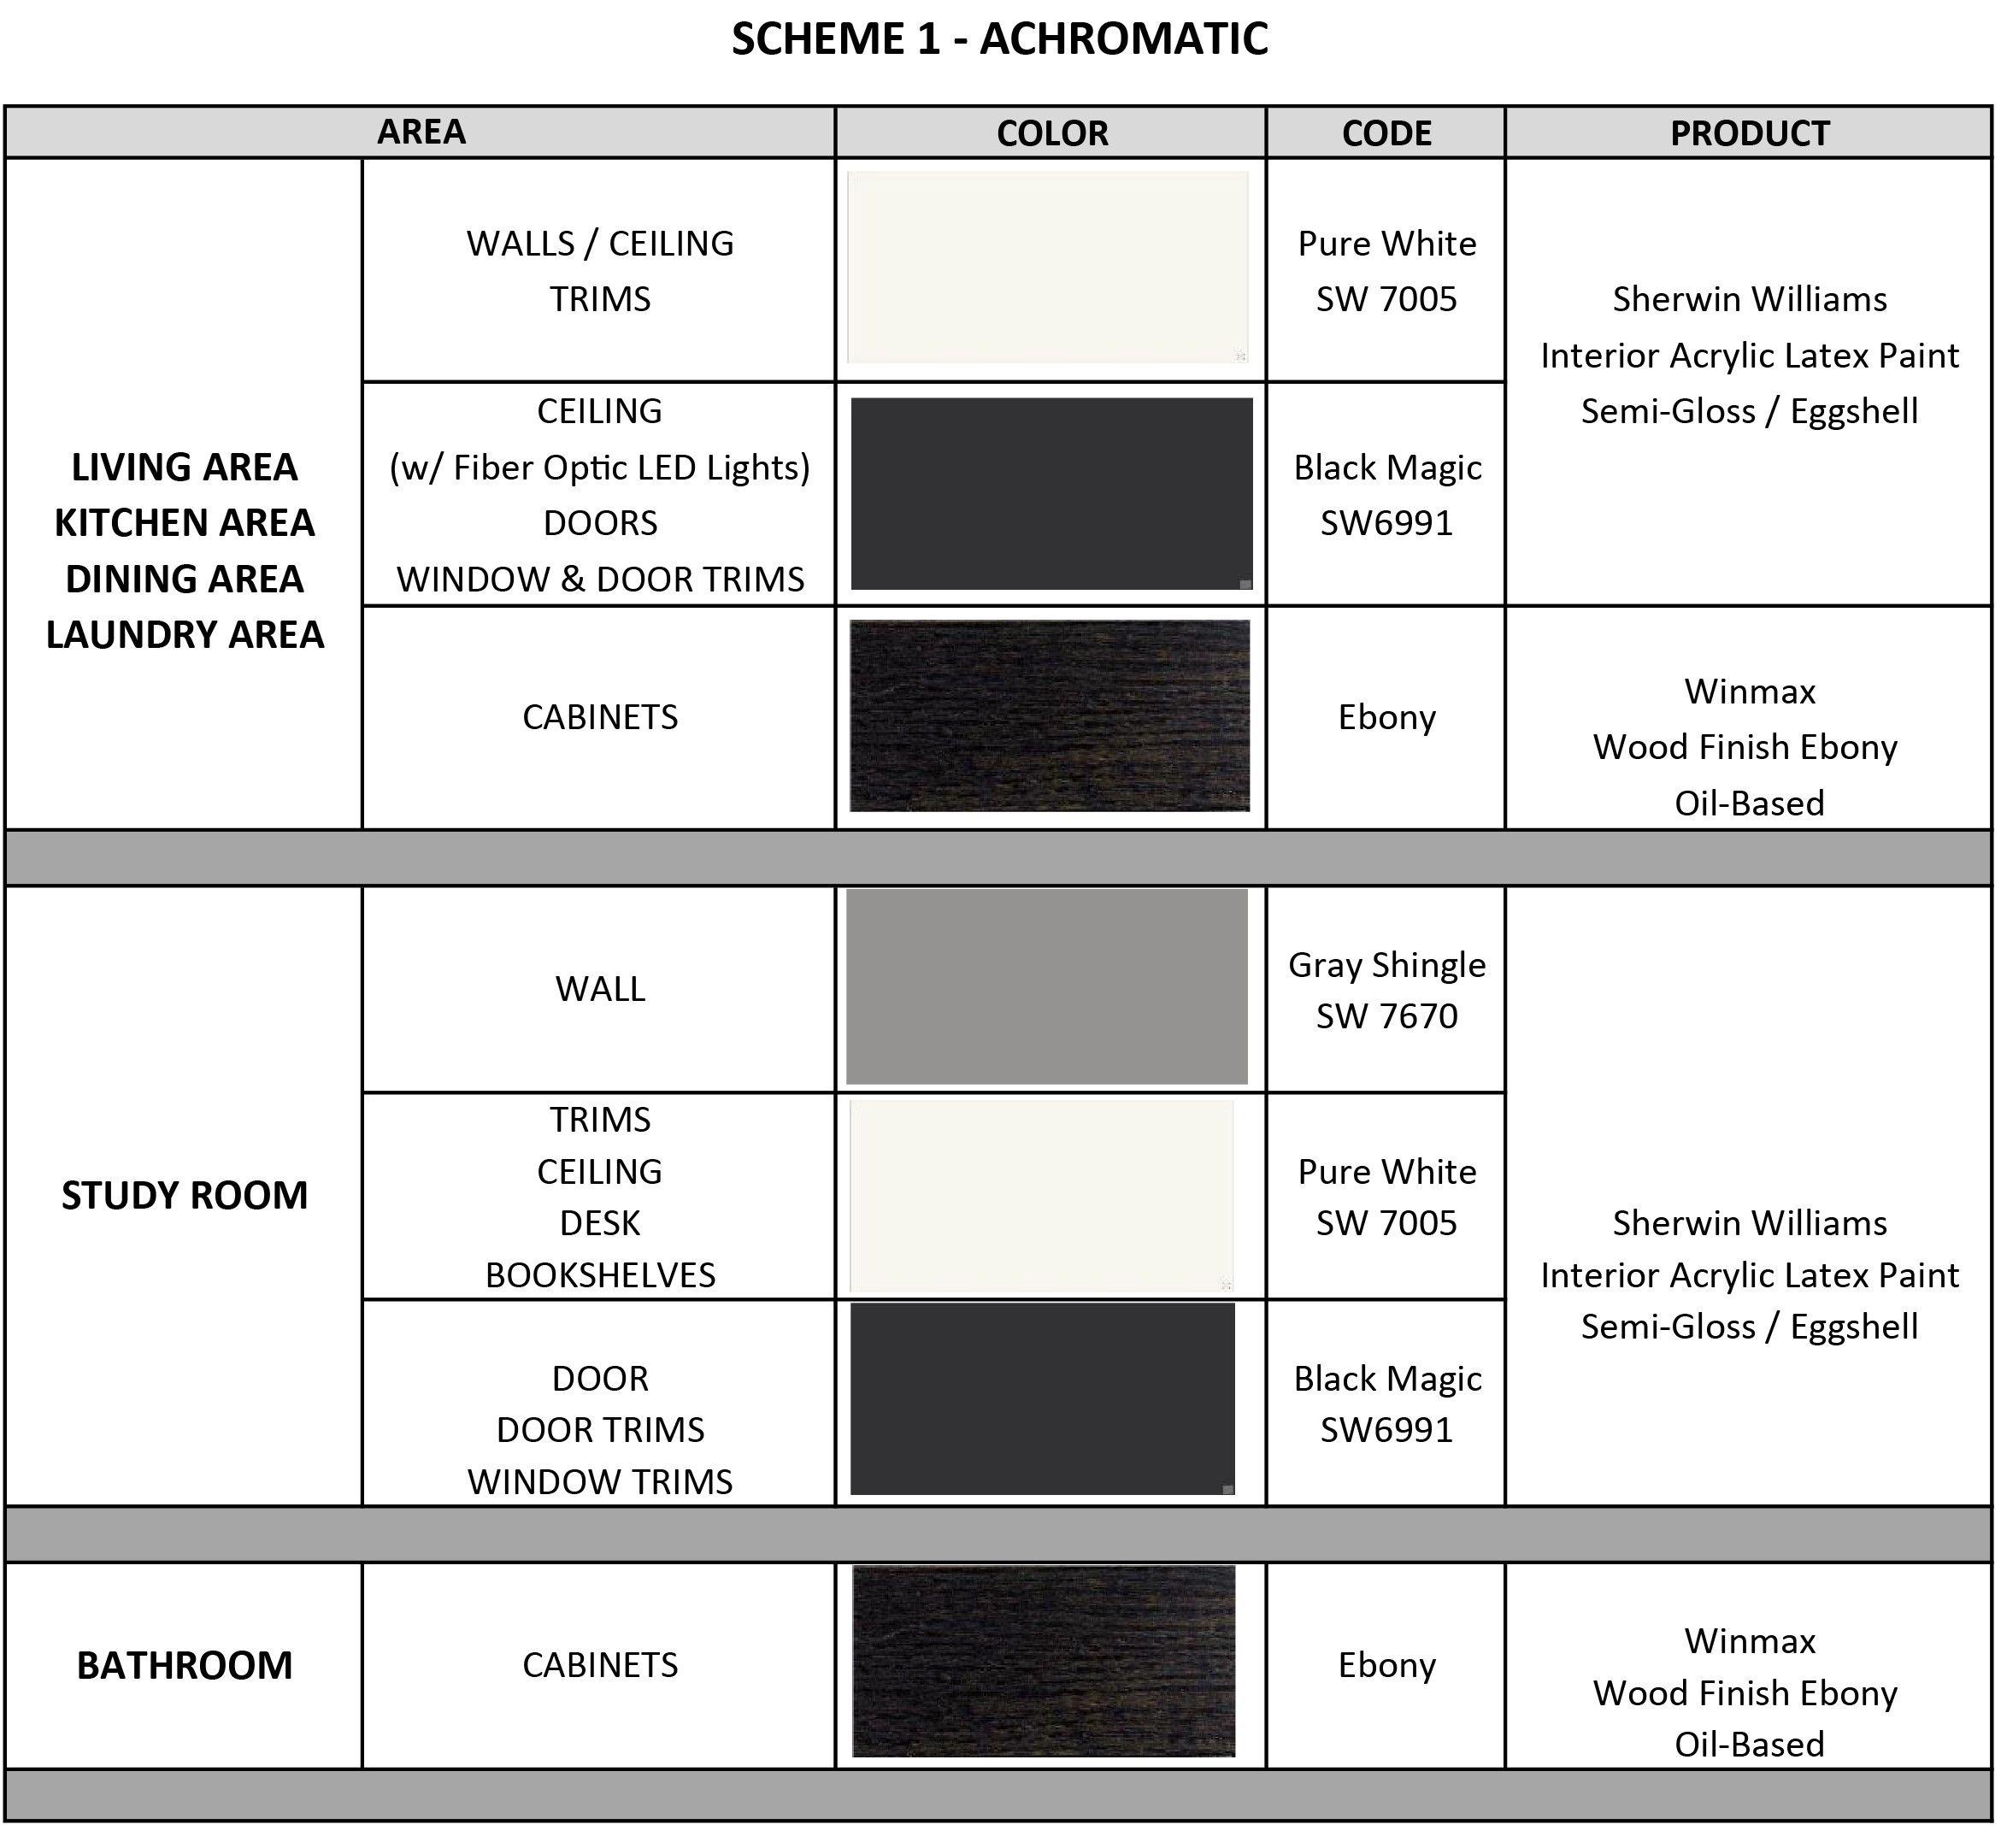 Assignment 6 Scheme 1 Achromatic With Images Interior Design